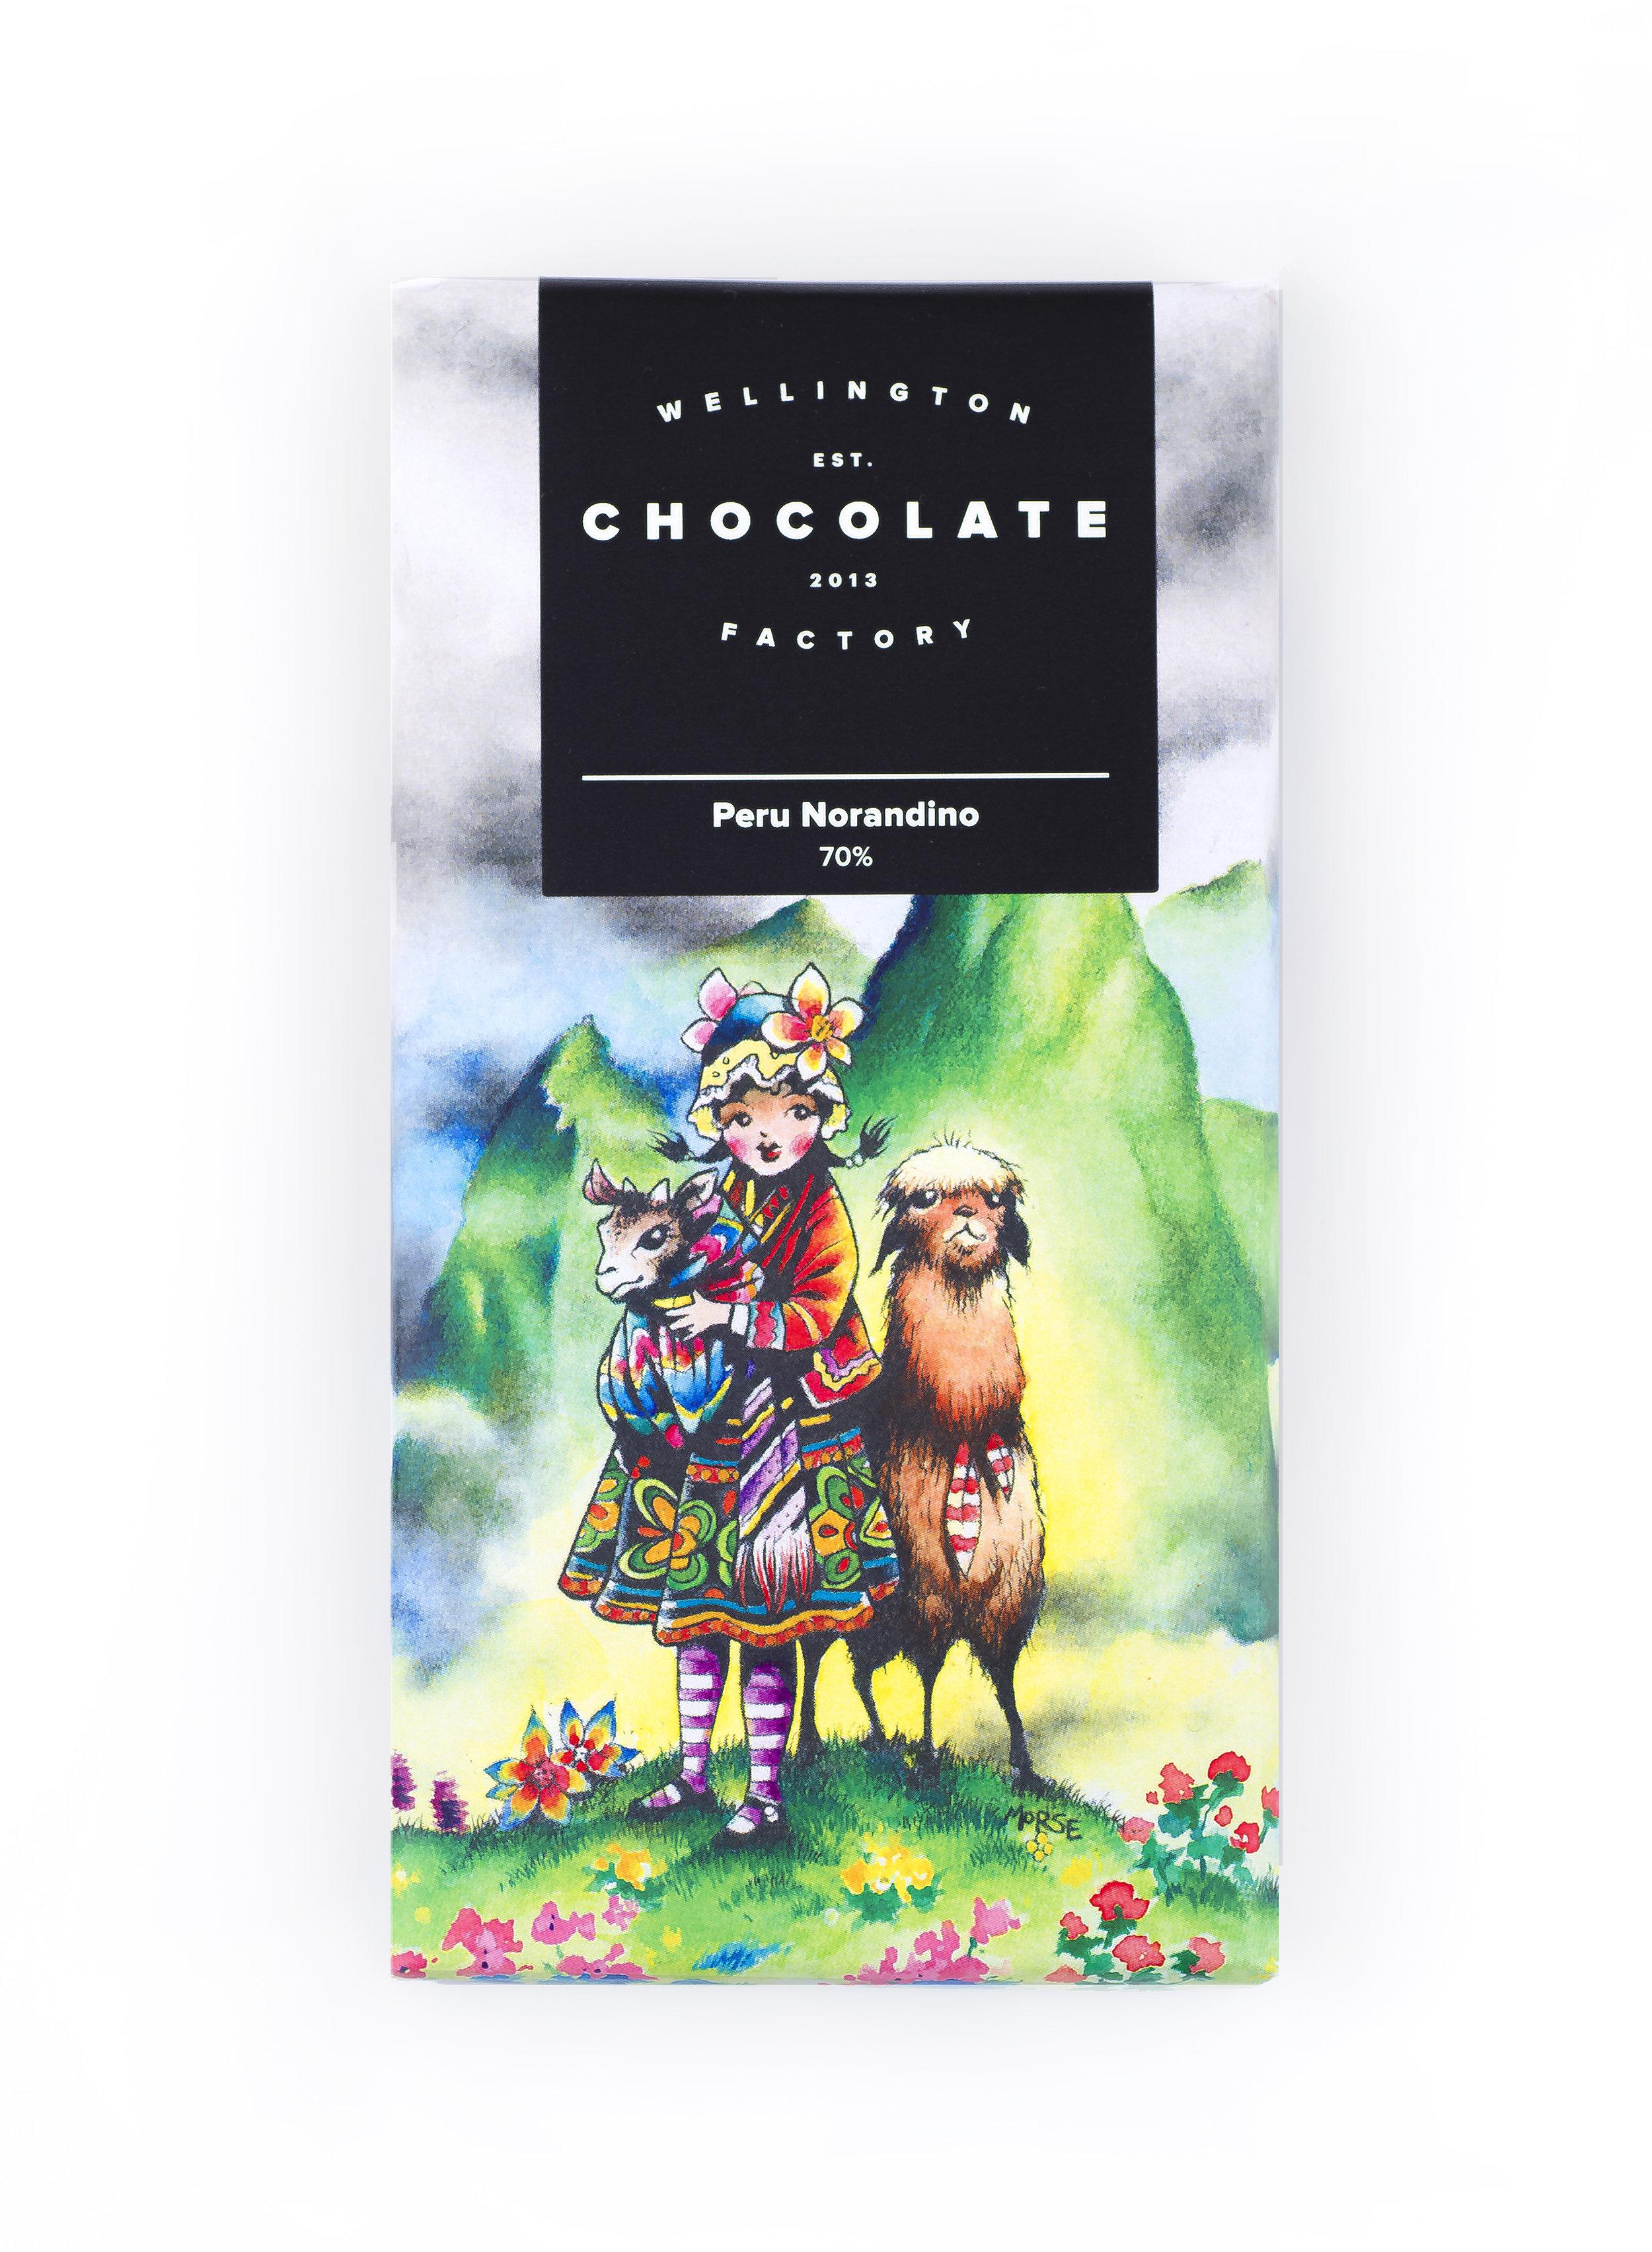 Peru Norandino Chocolate Bar - Single origin chocolate made solely with Peruvian Criollo cacao and Paraguay cane sugar.